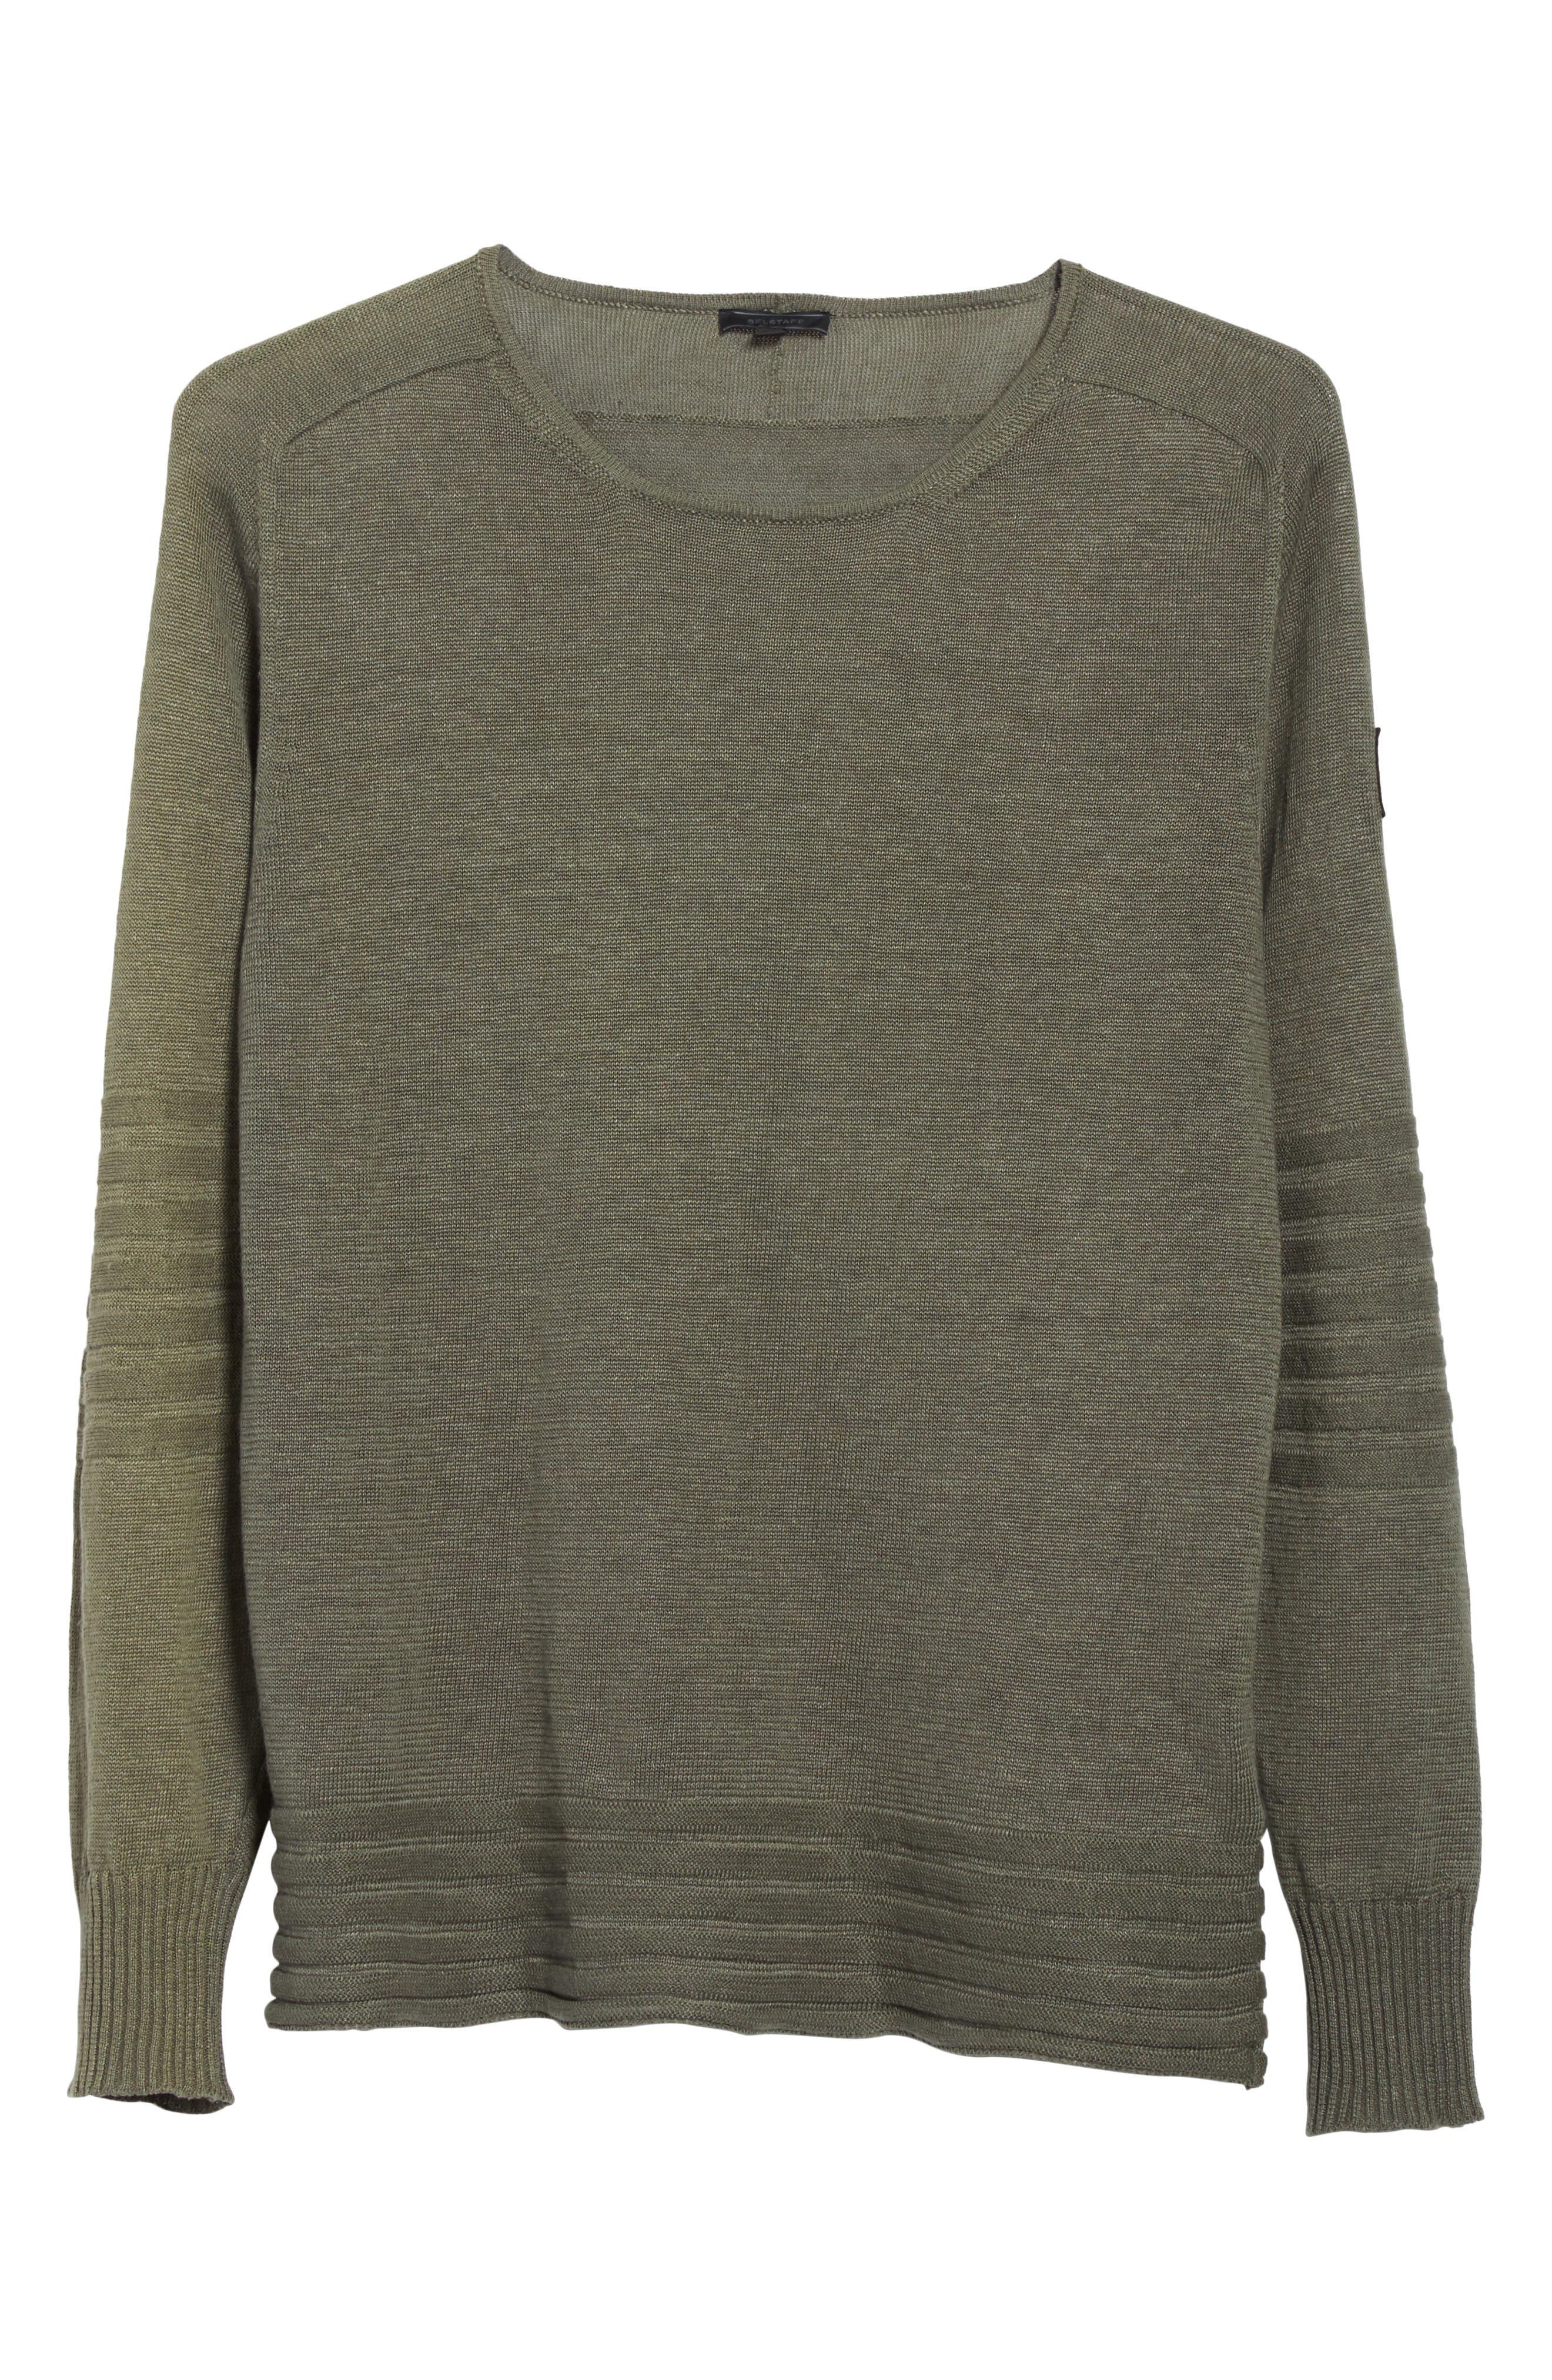 Exford Linen Crewneck Sweater,                             Alternate thumbnail 12, color,